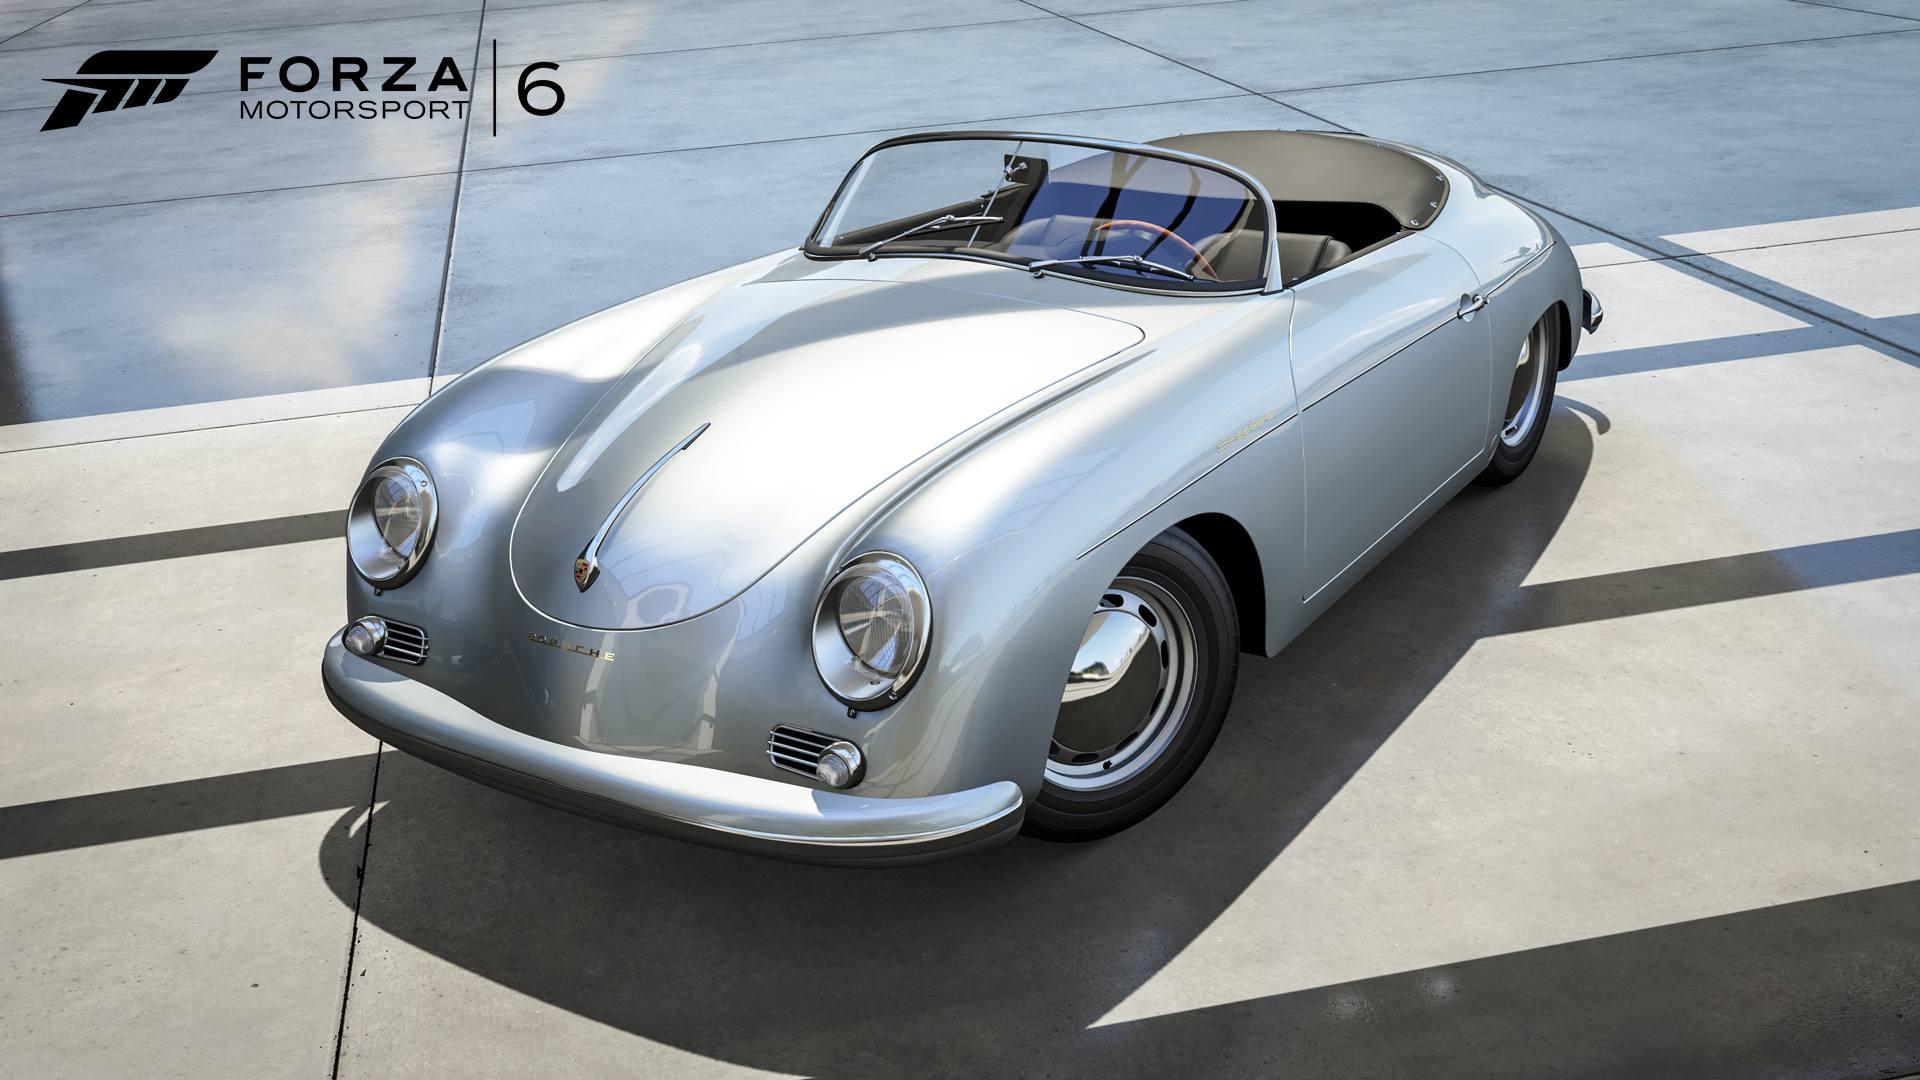 Forza Motorsport 6 01-03-16 1957 Porsche 356A Speedster